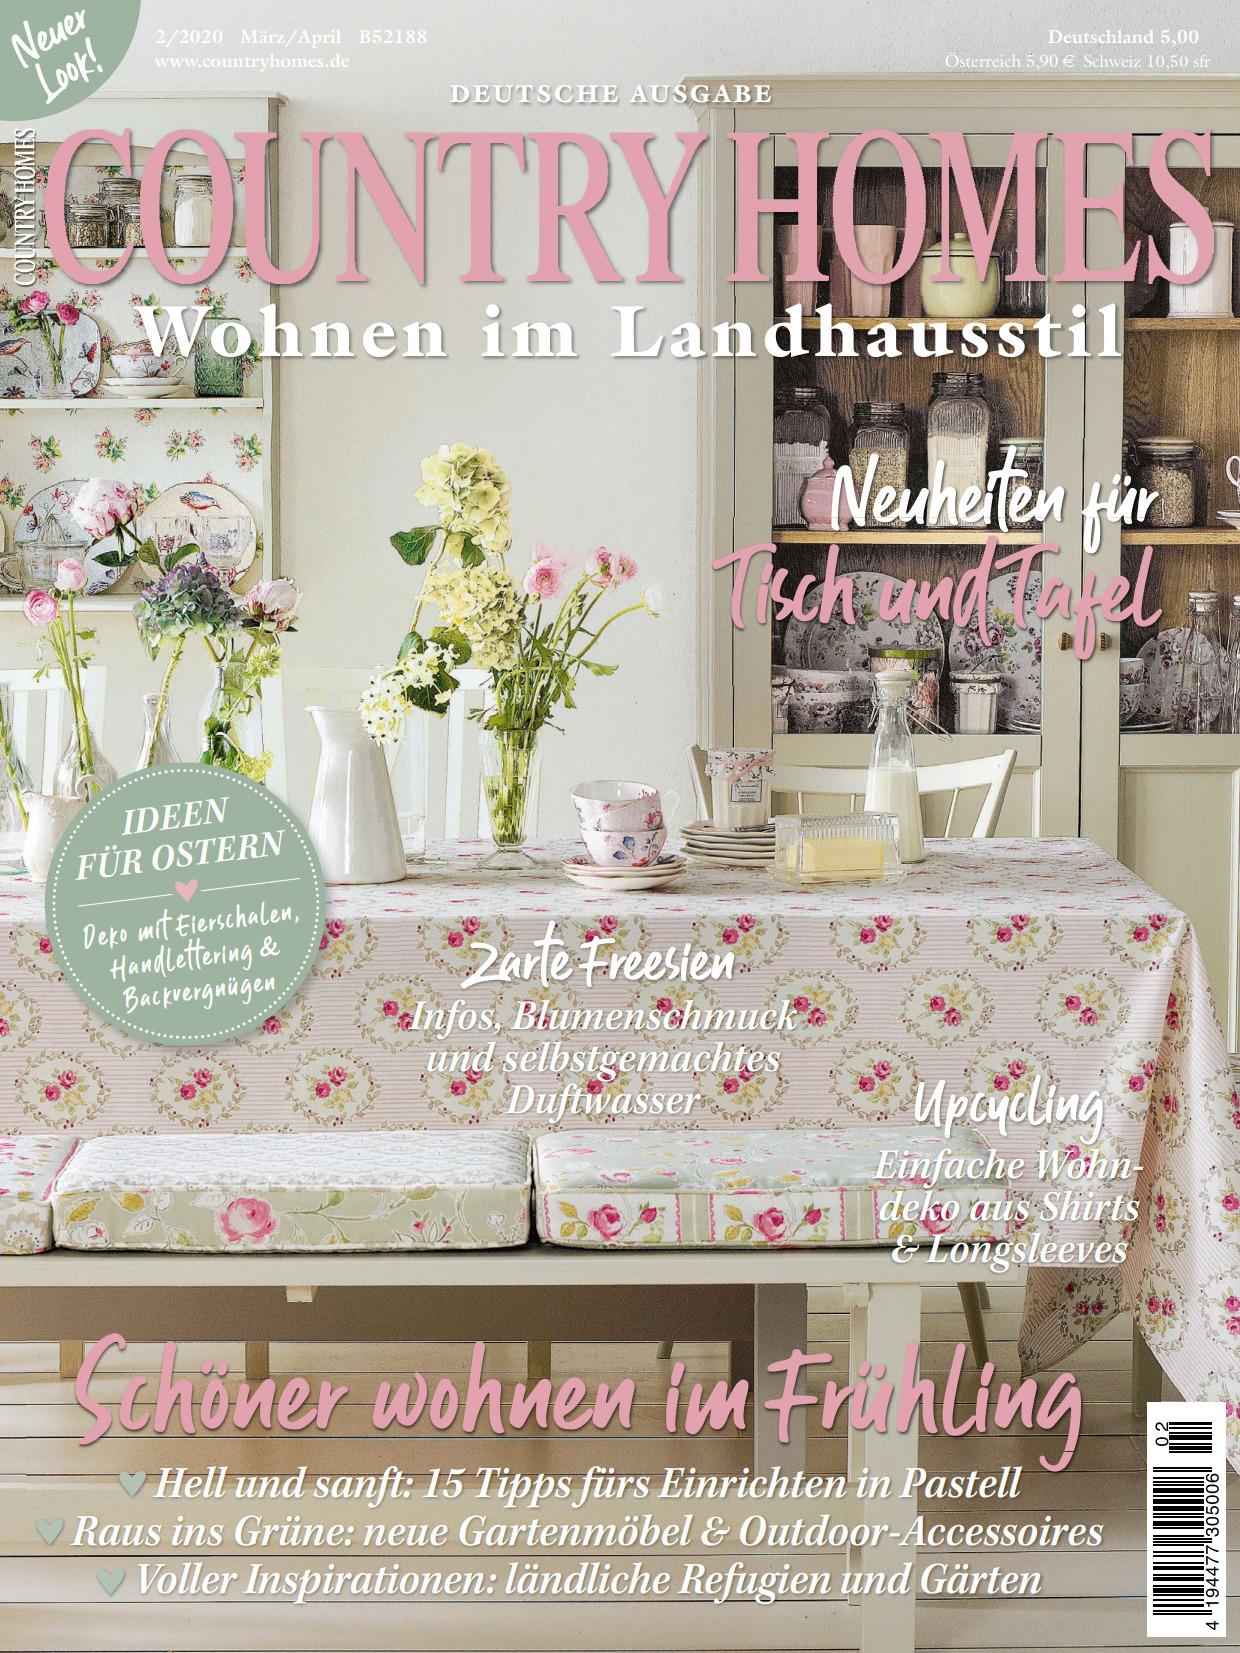 《Country Homes》德国版时尚家居杂志2020年03-04月号